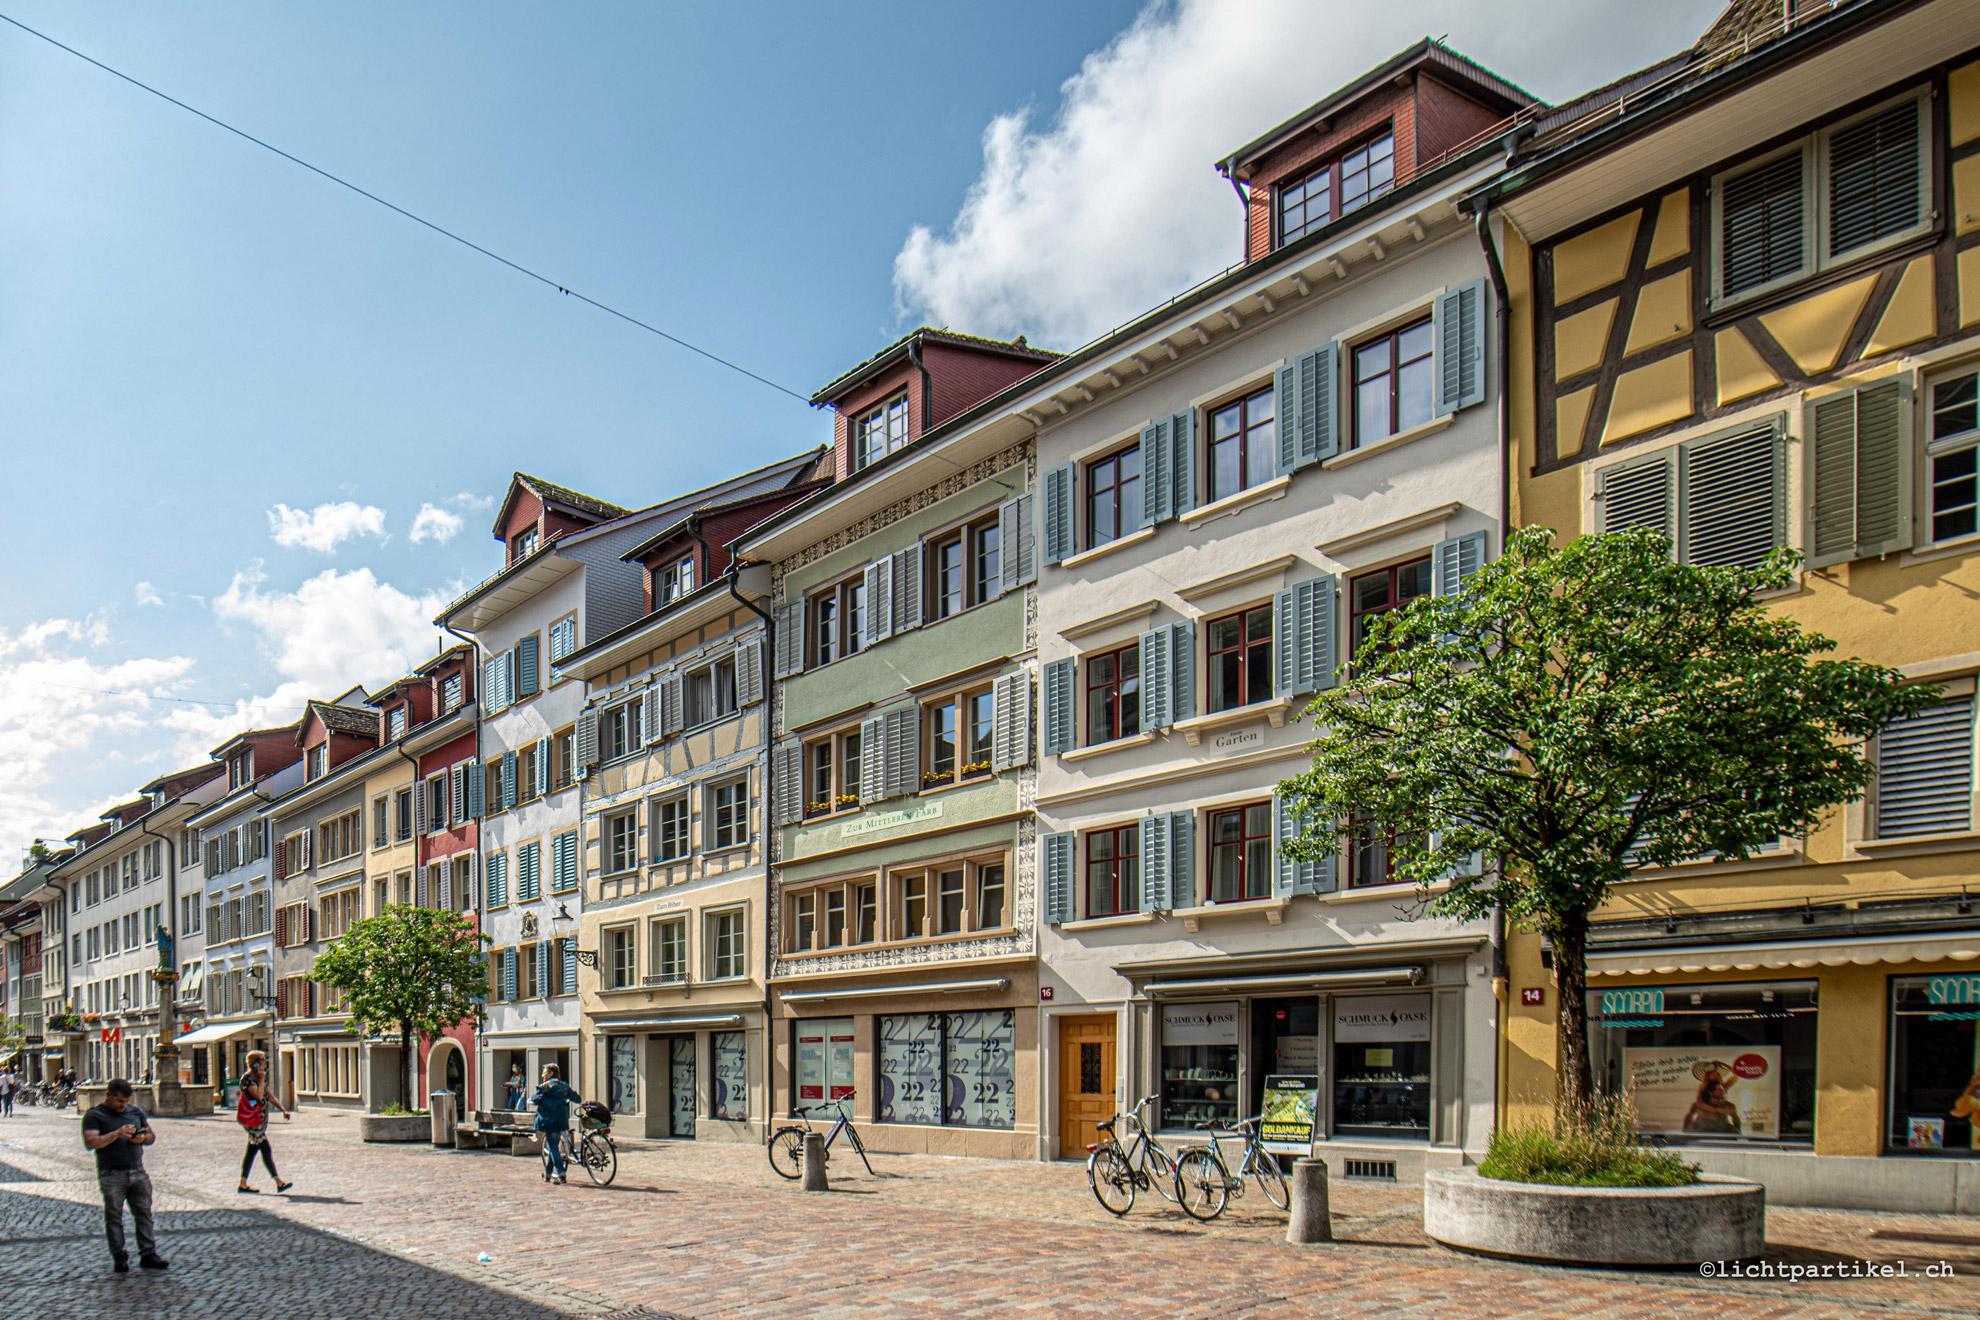 15-Fassade-Altstadt-Winterthur-1980x1320